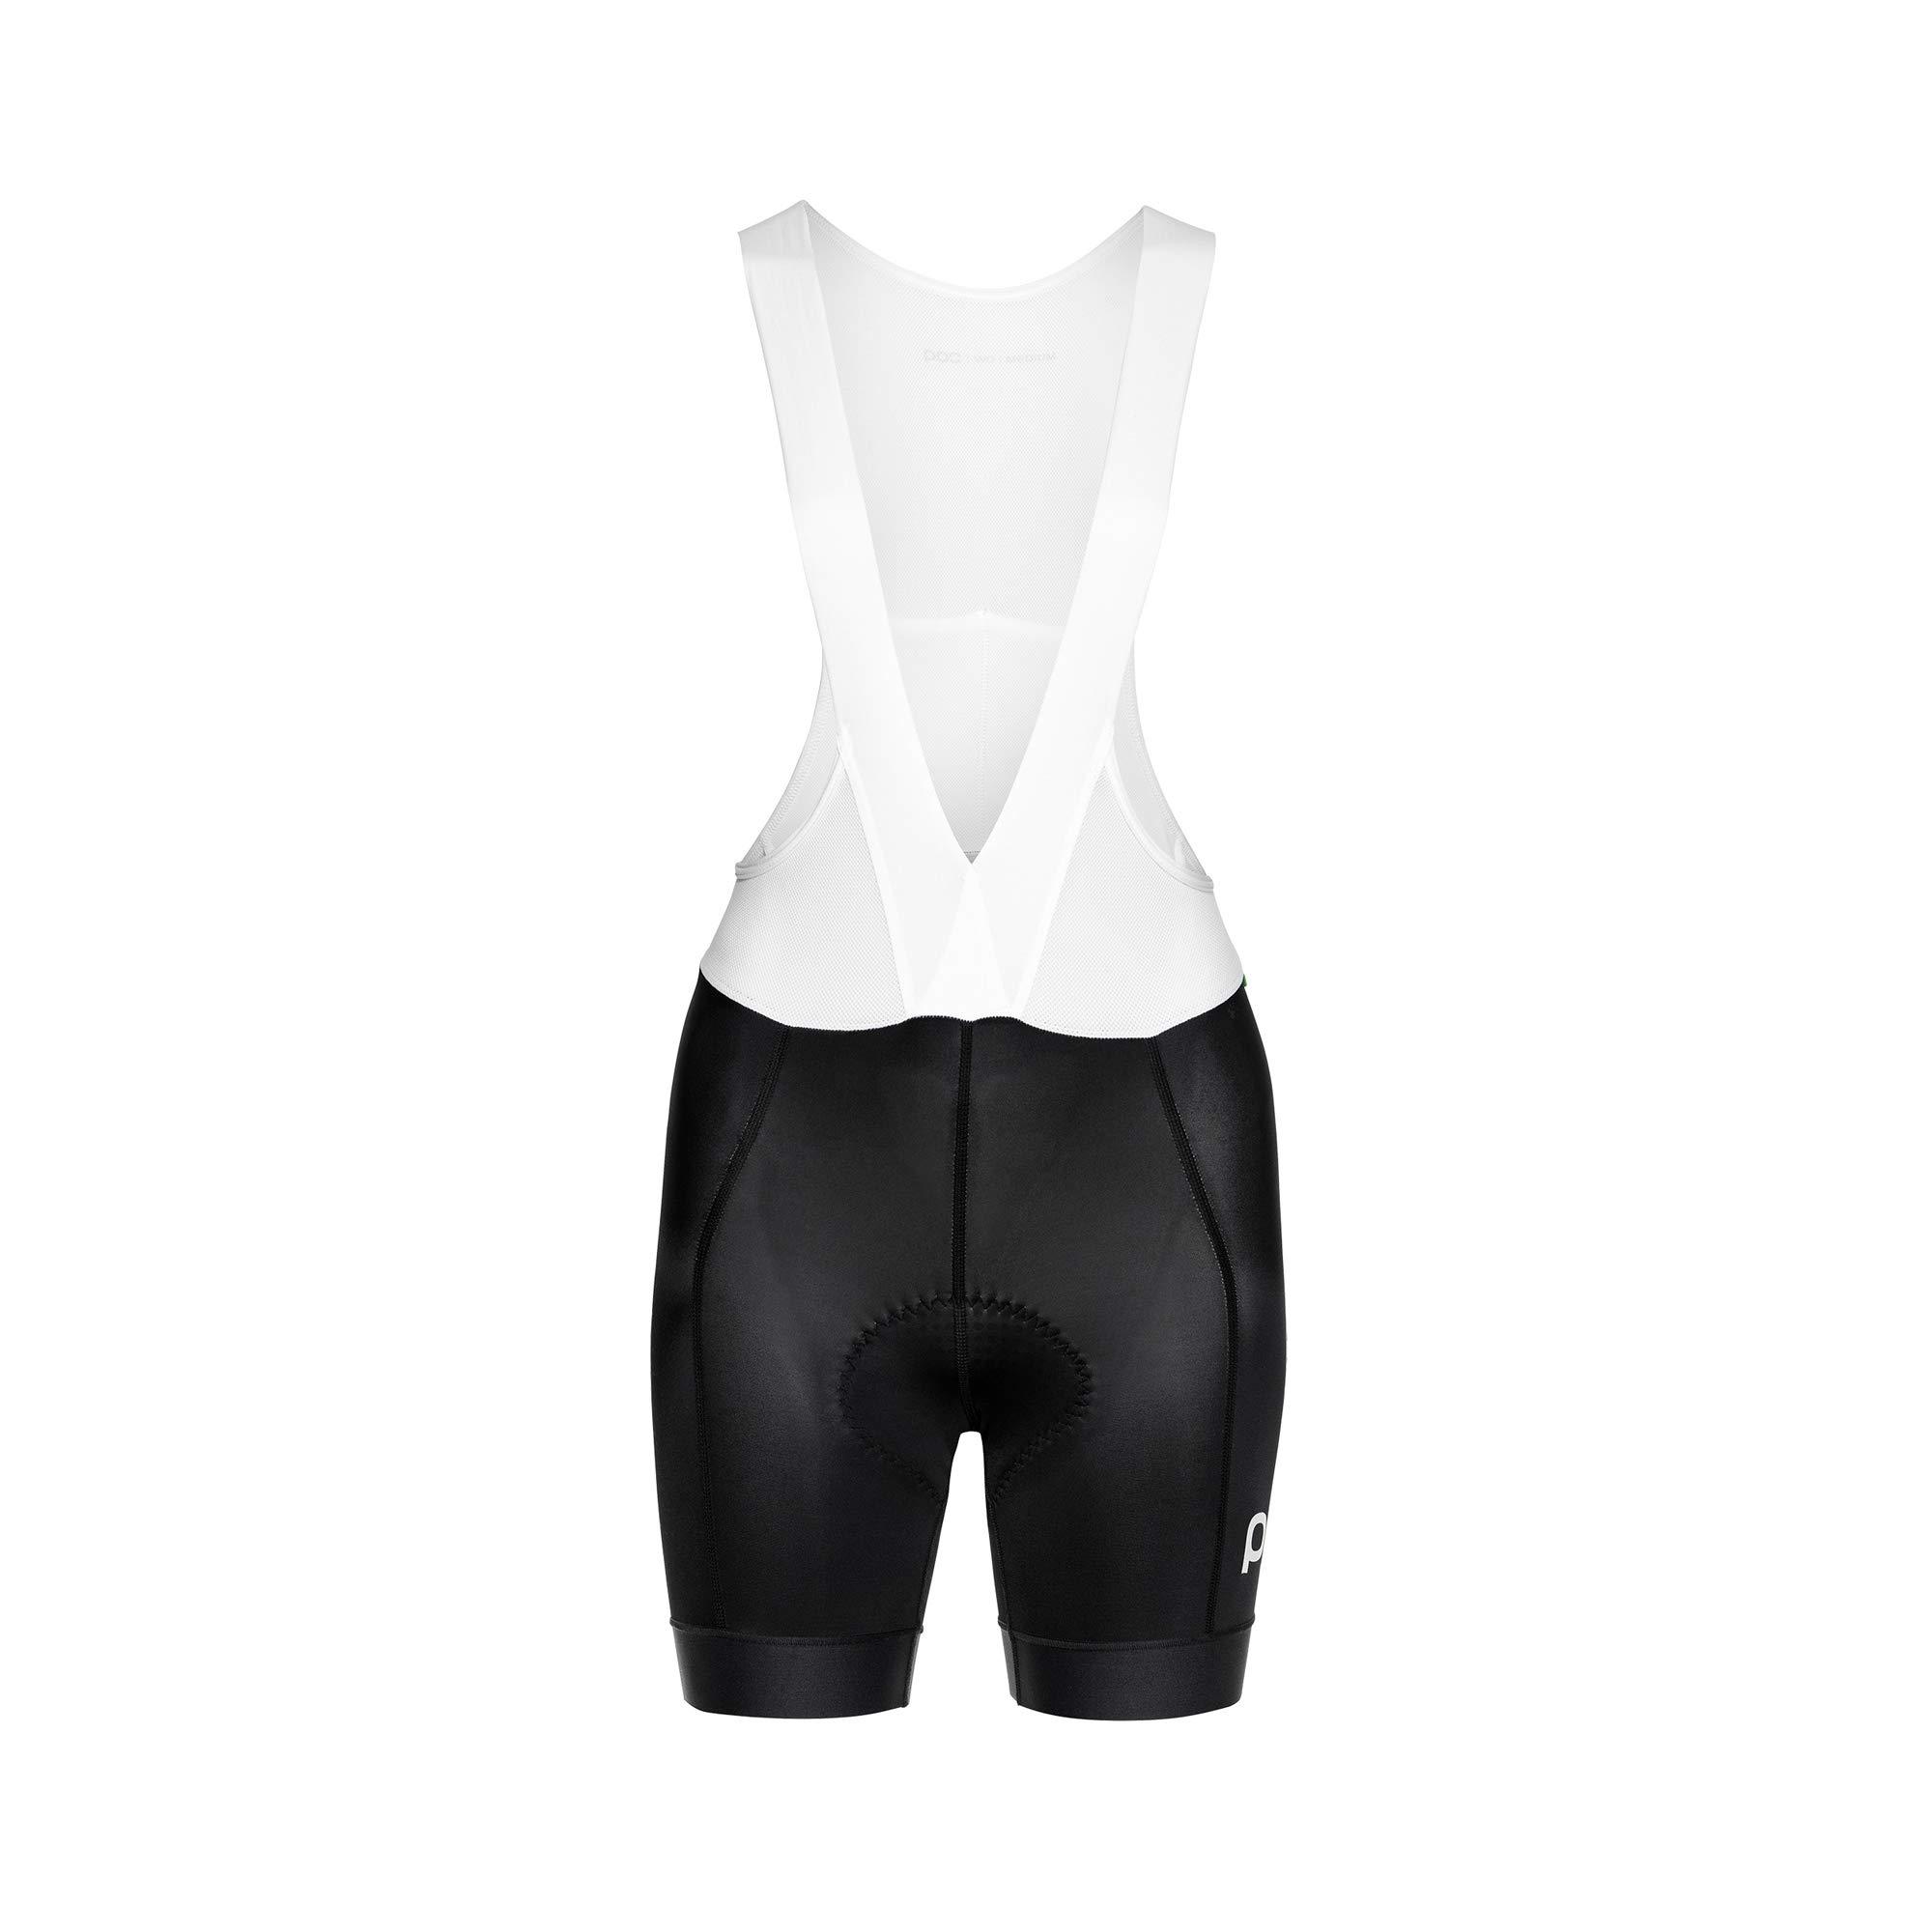 POC Essential Road Women Bib Shorts, Women's Cycling Apparel, Uranium Black, XS